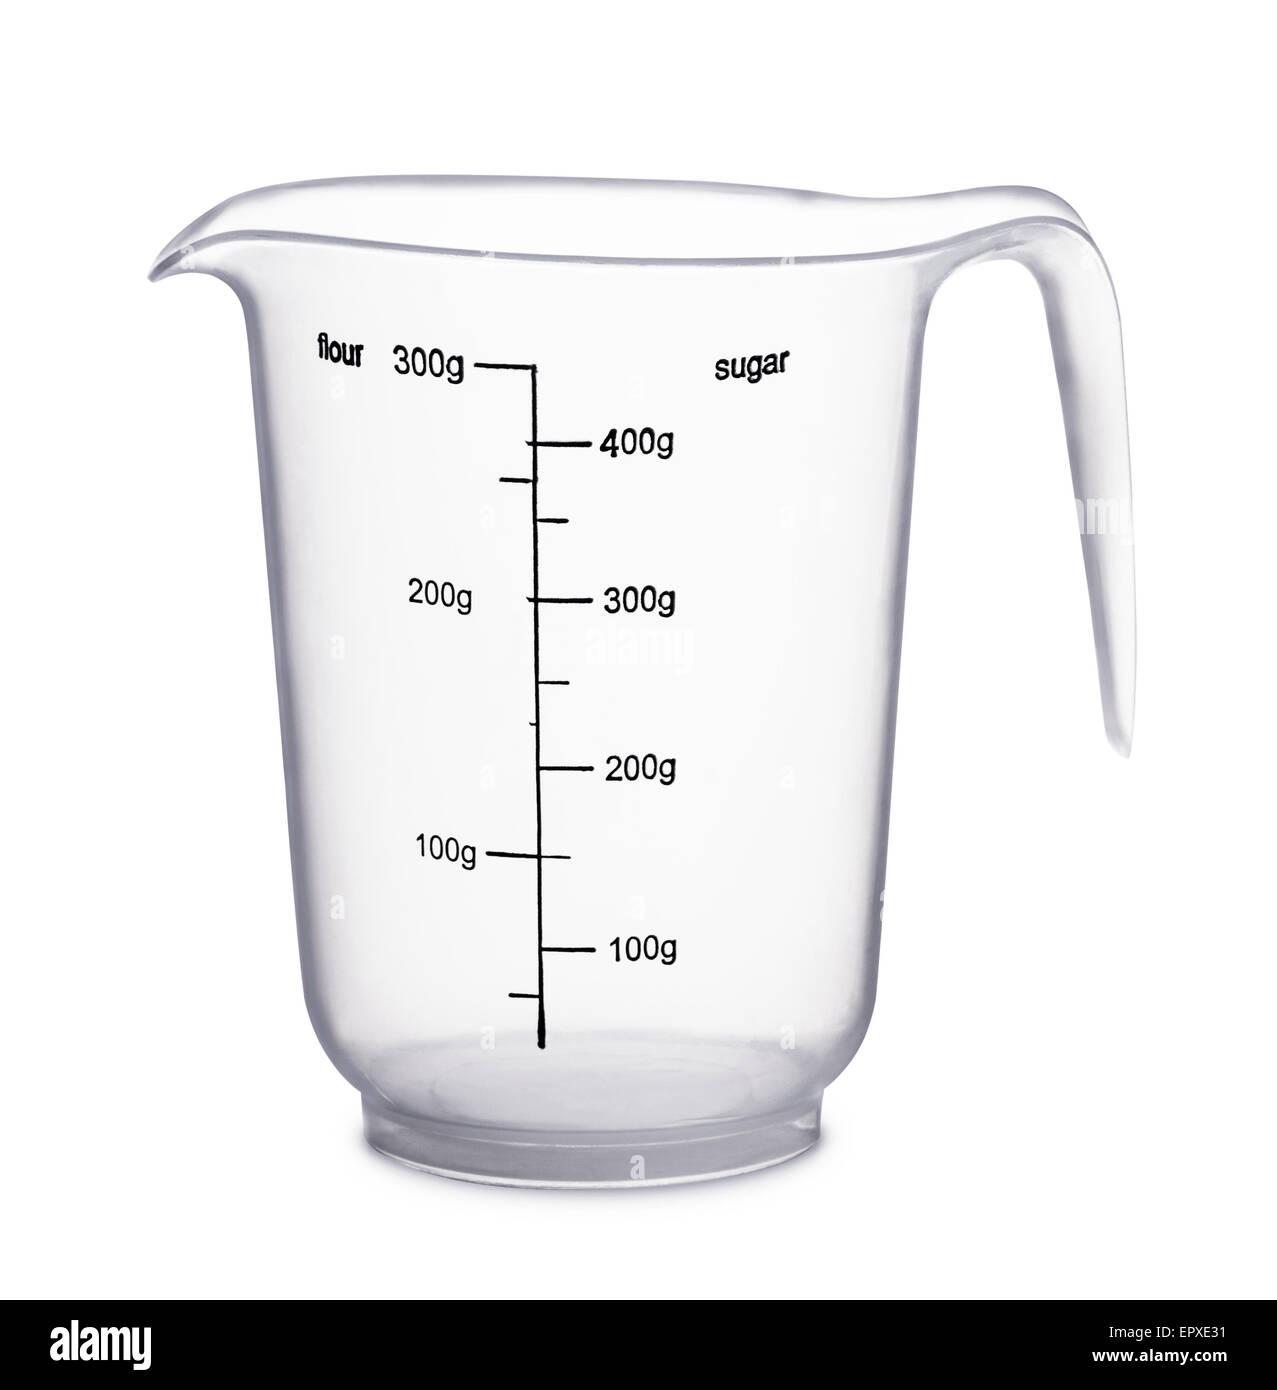 Empty beaker on a white background - Stock Image